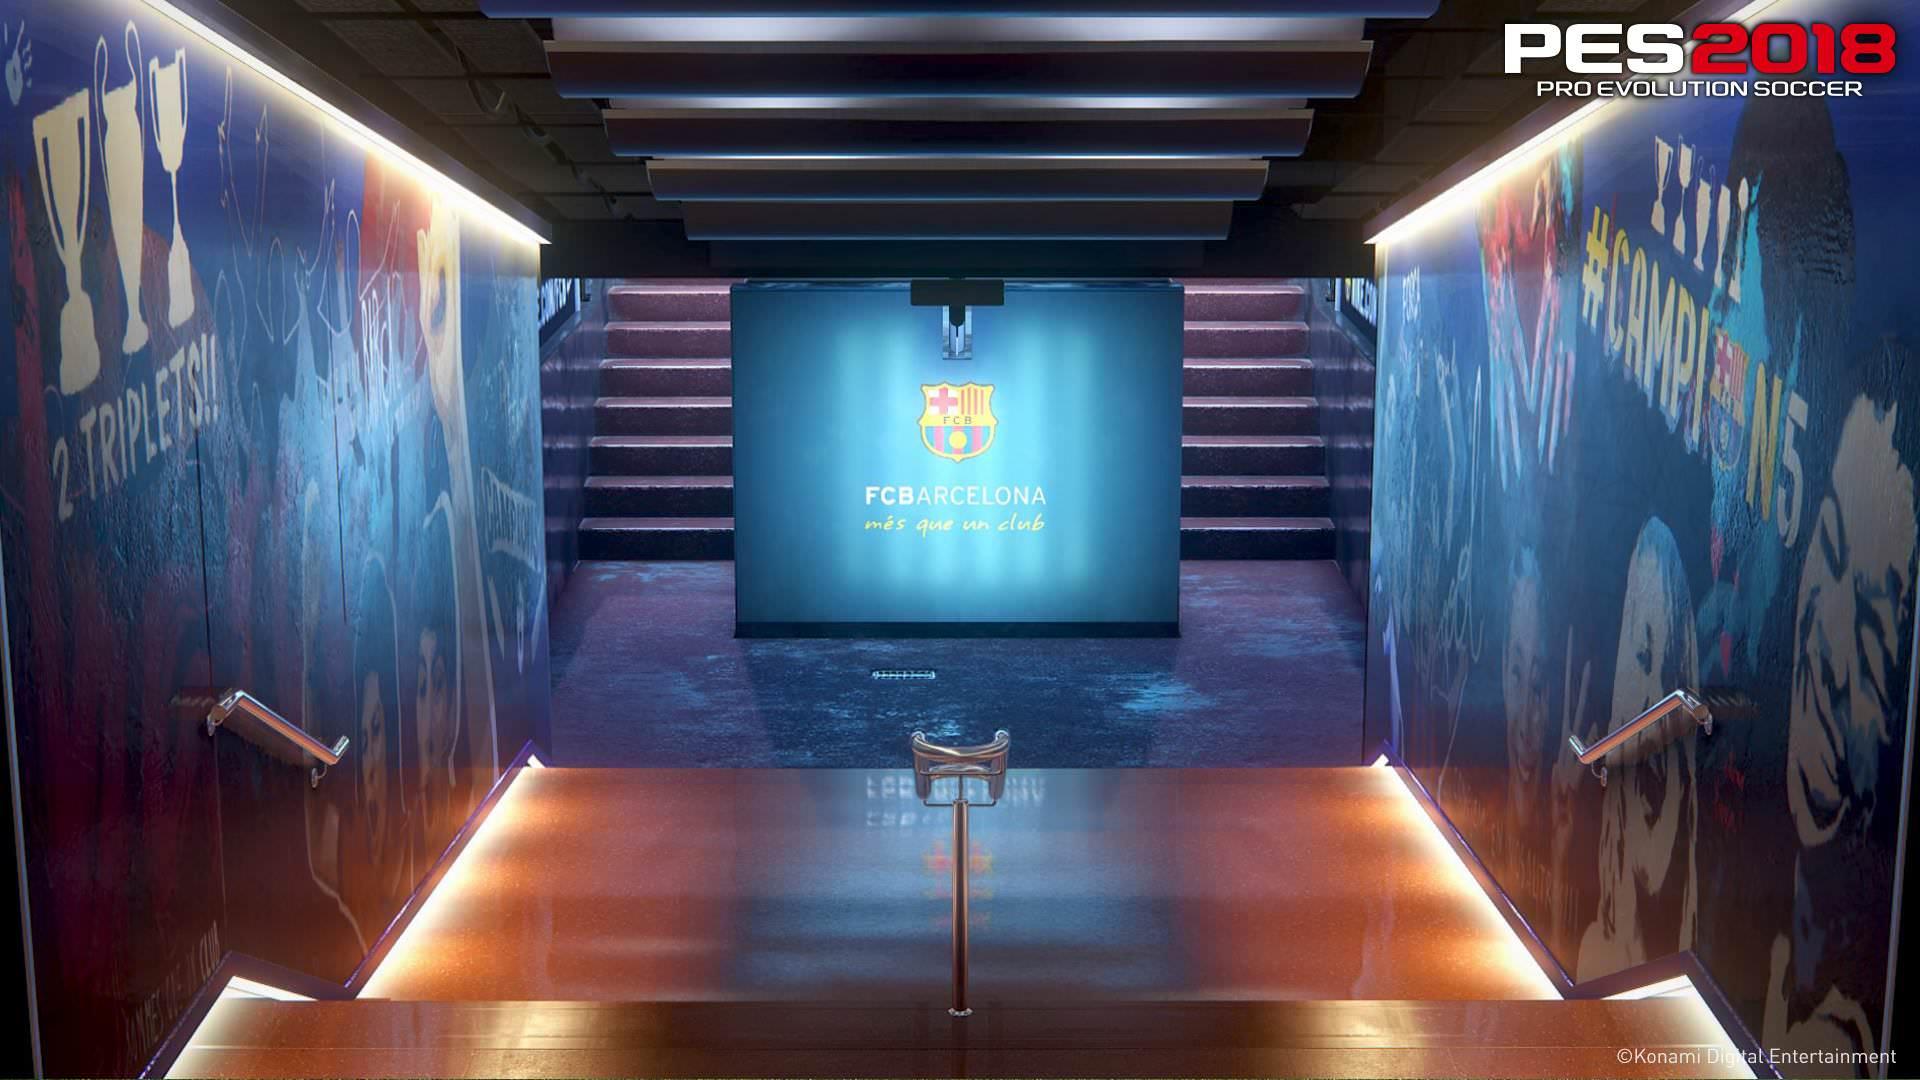 PES 2018 Camp Nou